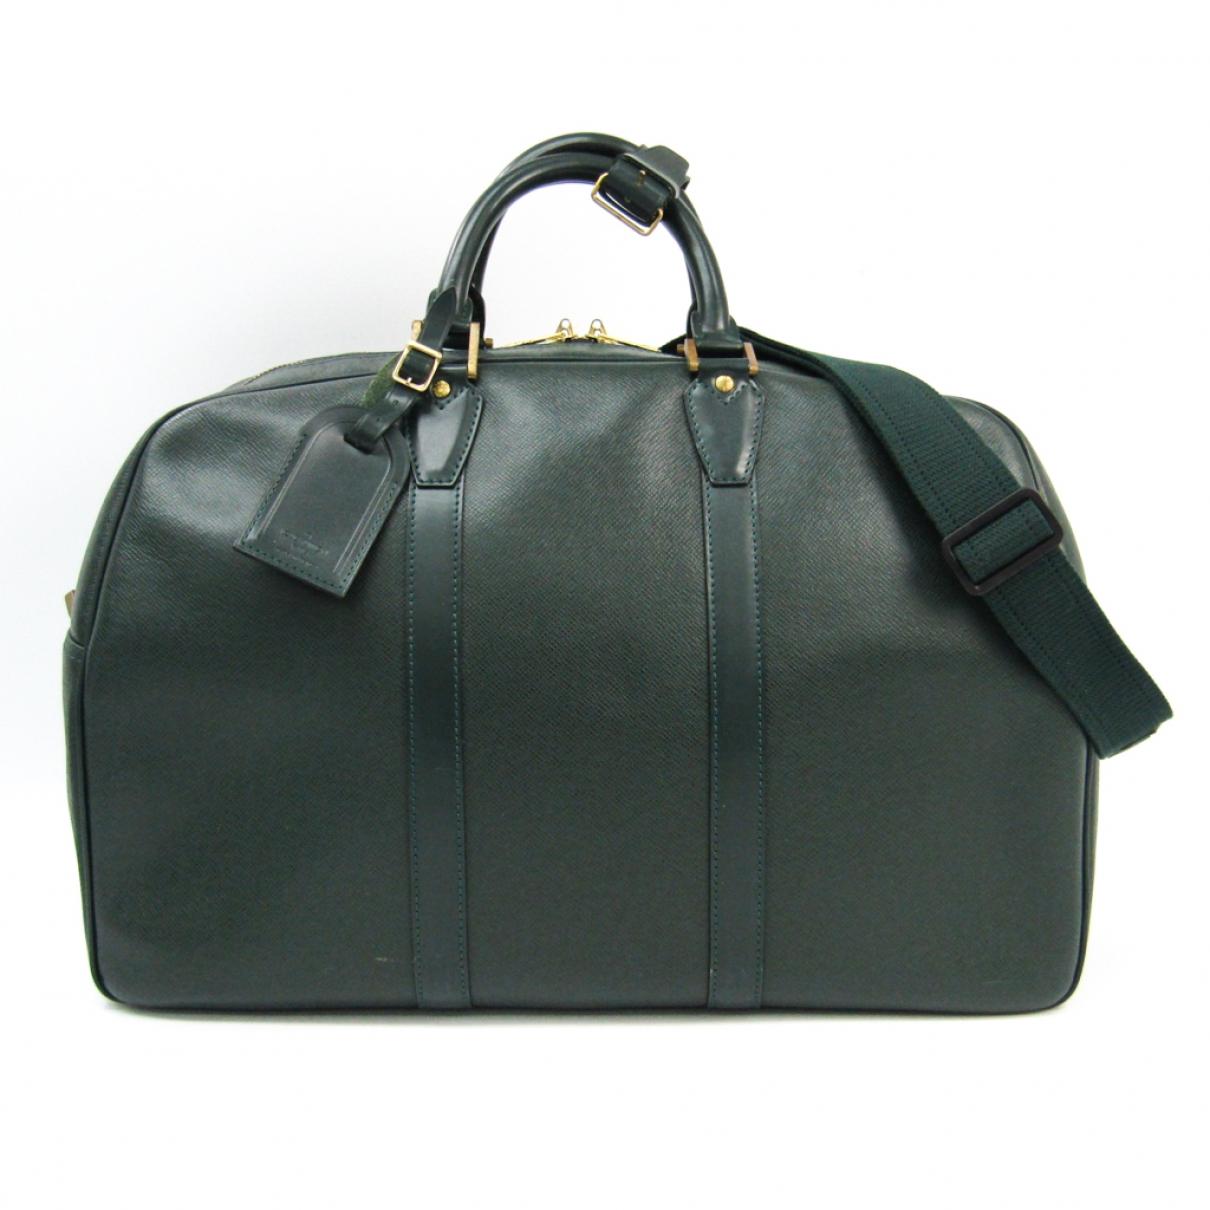 Louis Vuitton \N Green Leather Travel bag for Women \N